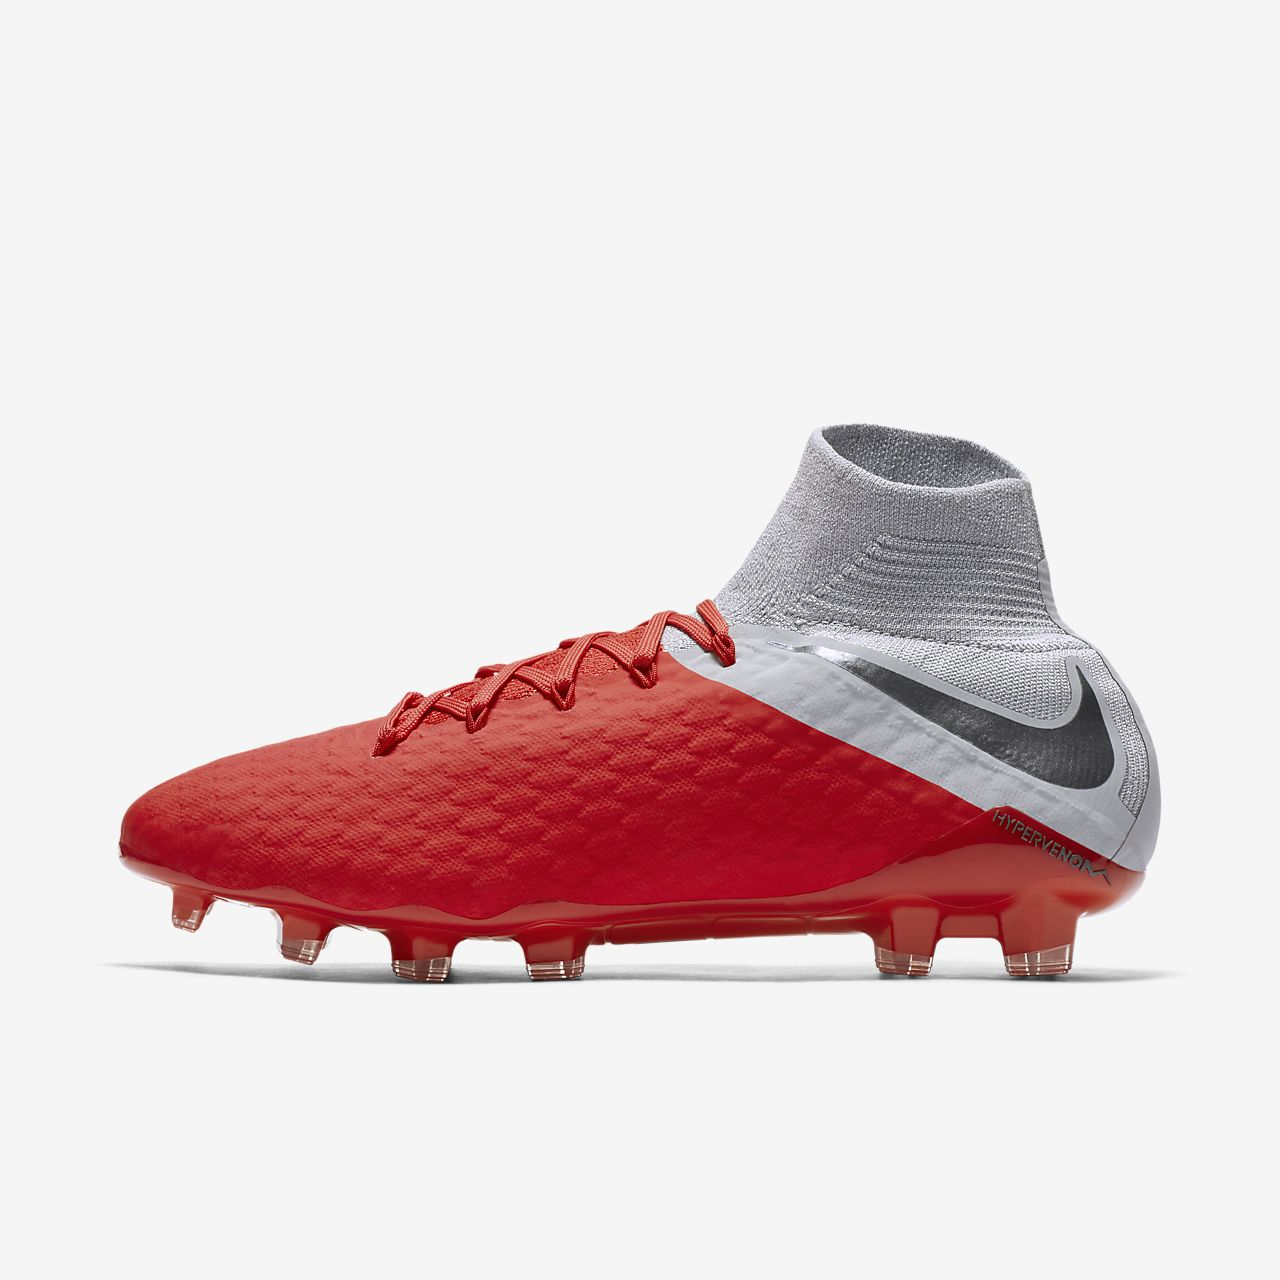 Nike Hypervenom Iii Pro Dynamic Fit Fussballschuh Fur Normalen Rasen